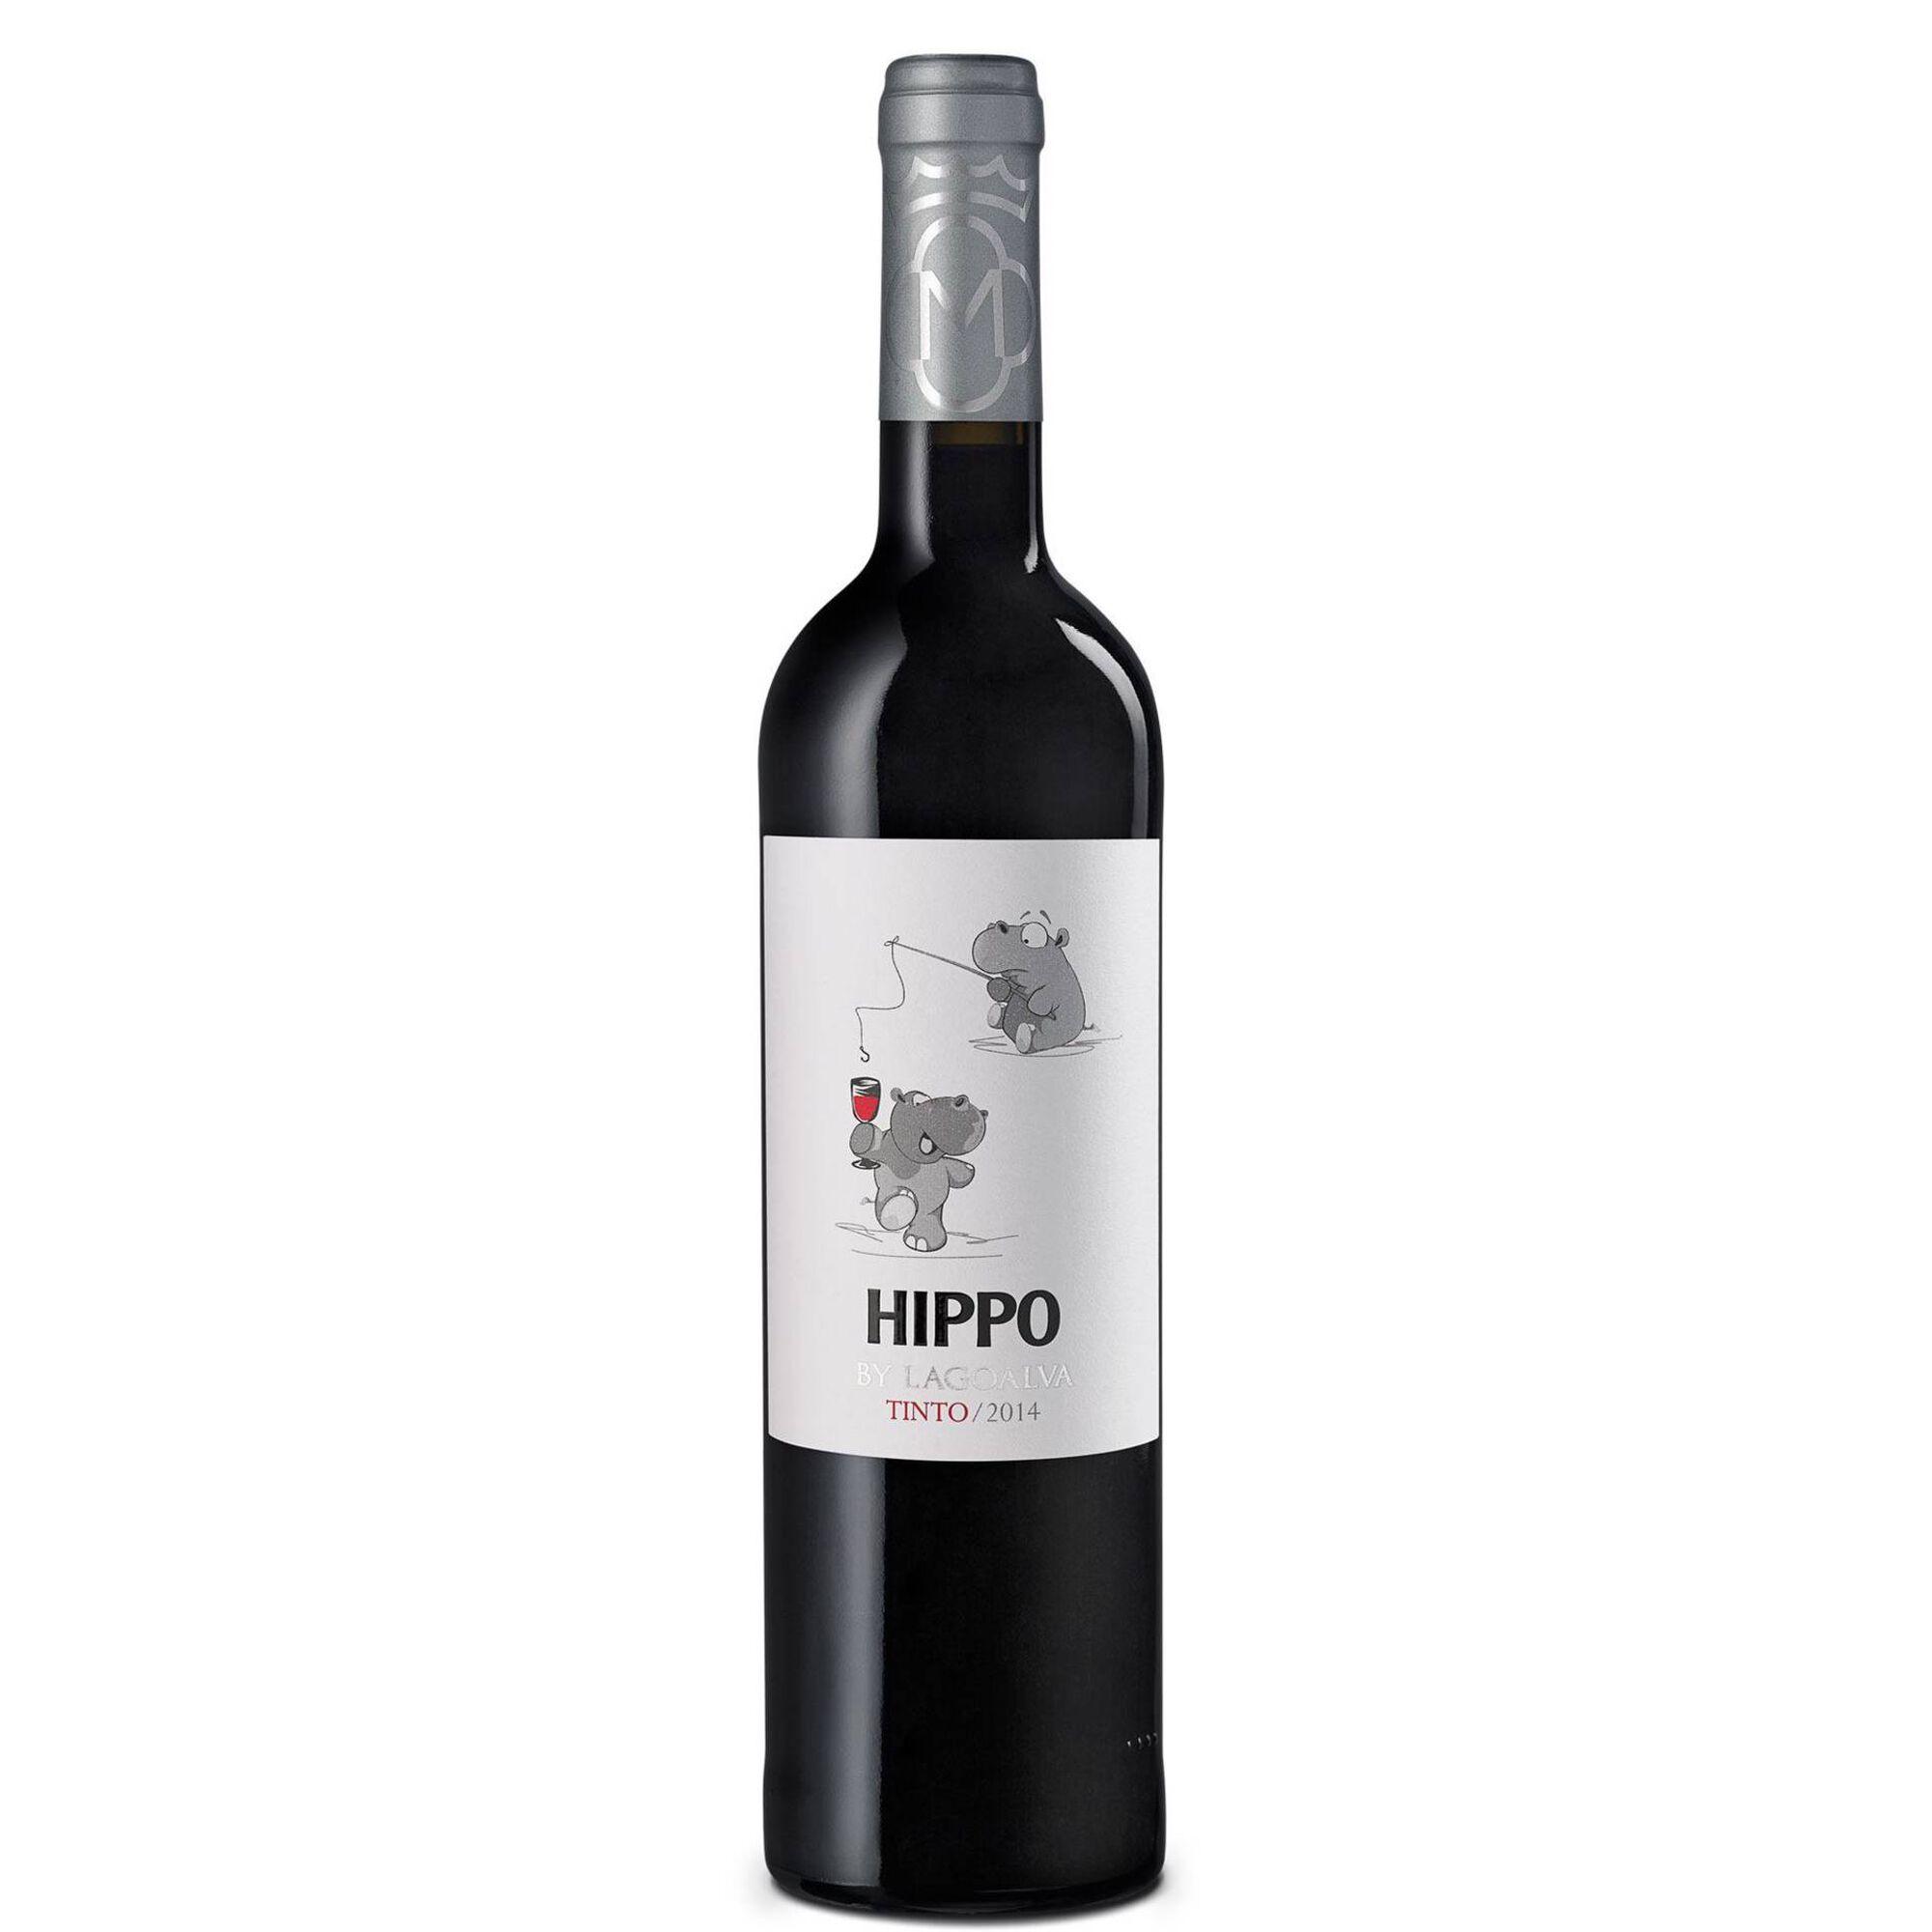 Hippo By Lagoalva Regional Tejo Vinho Tinto